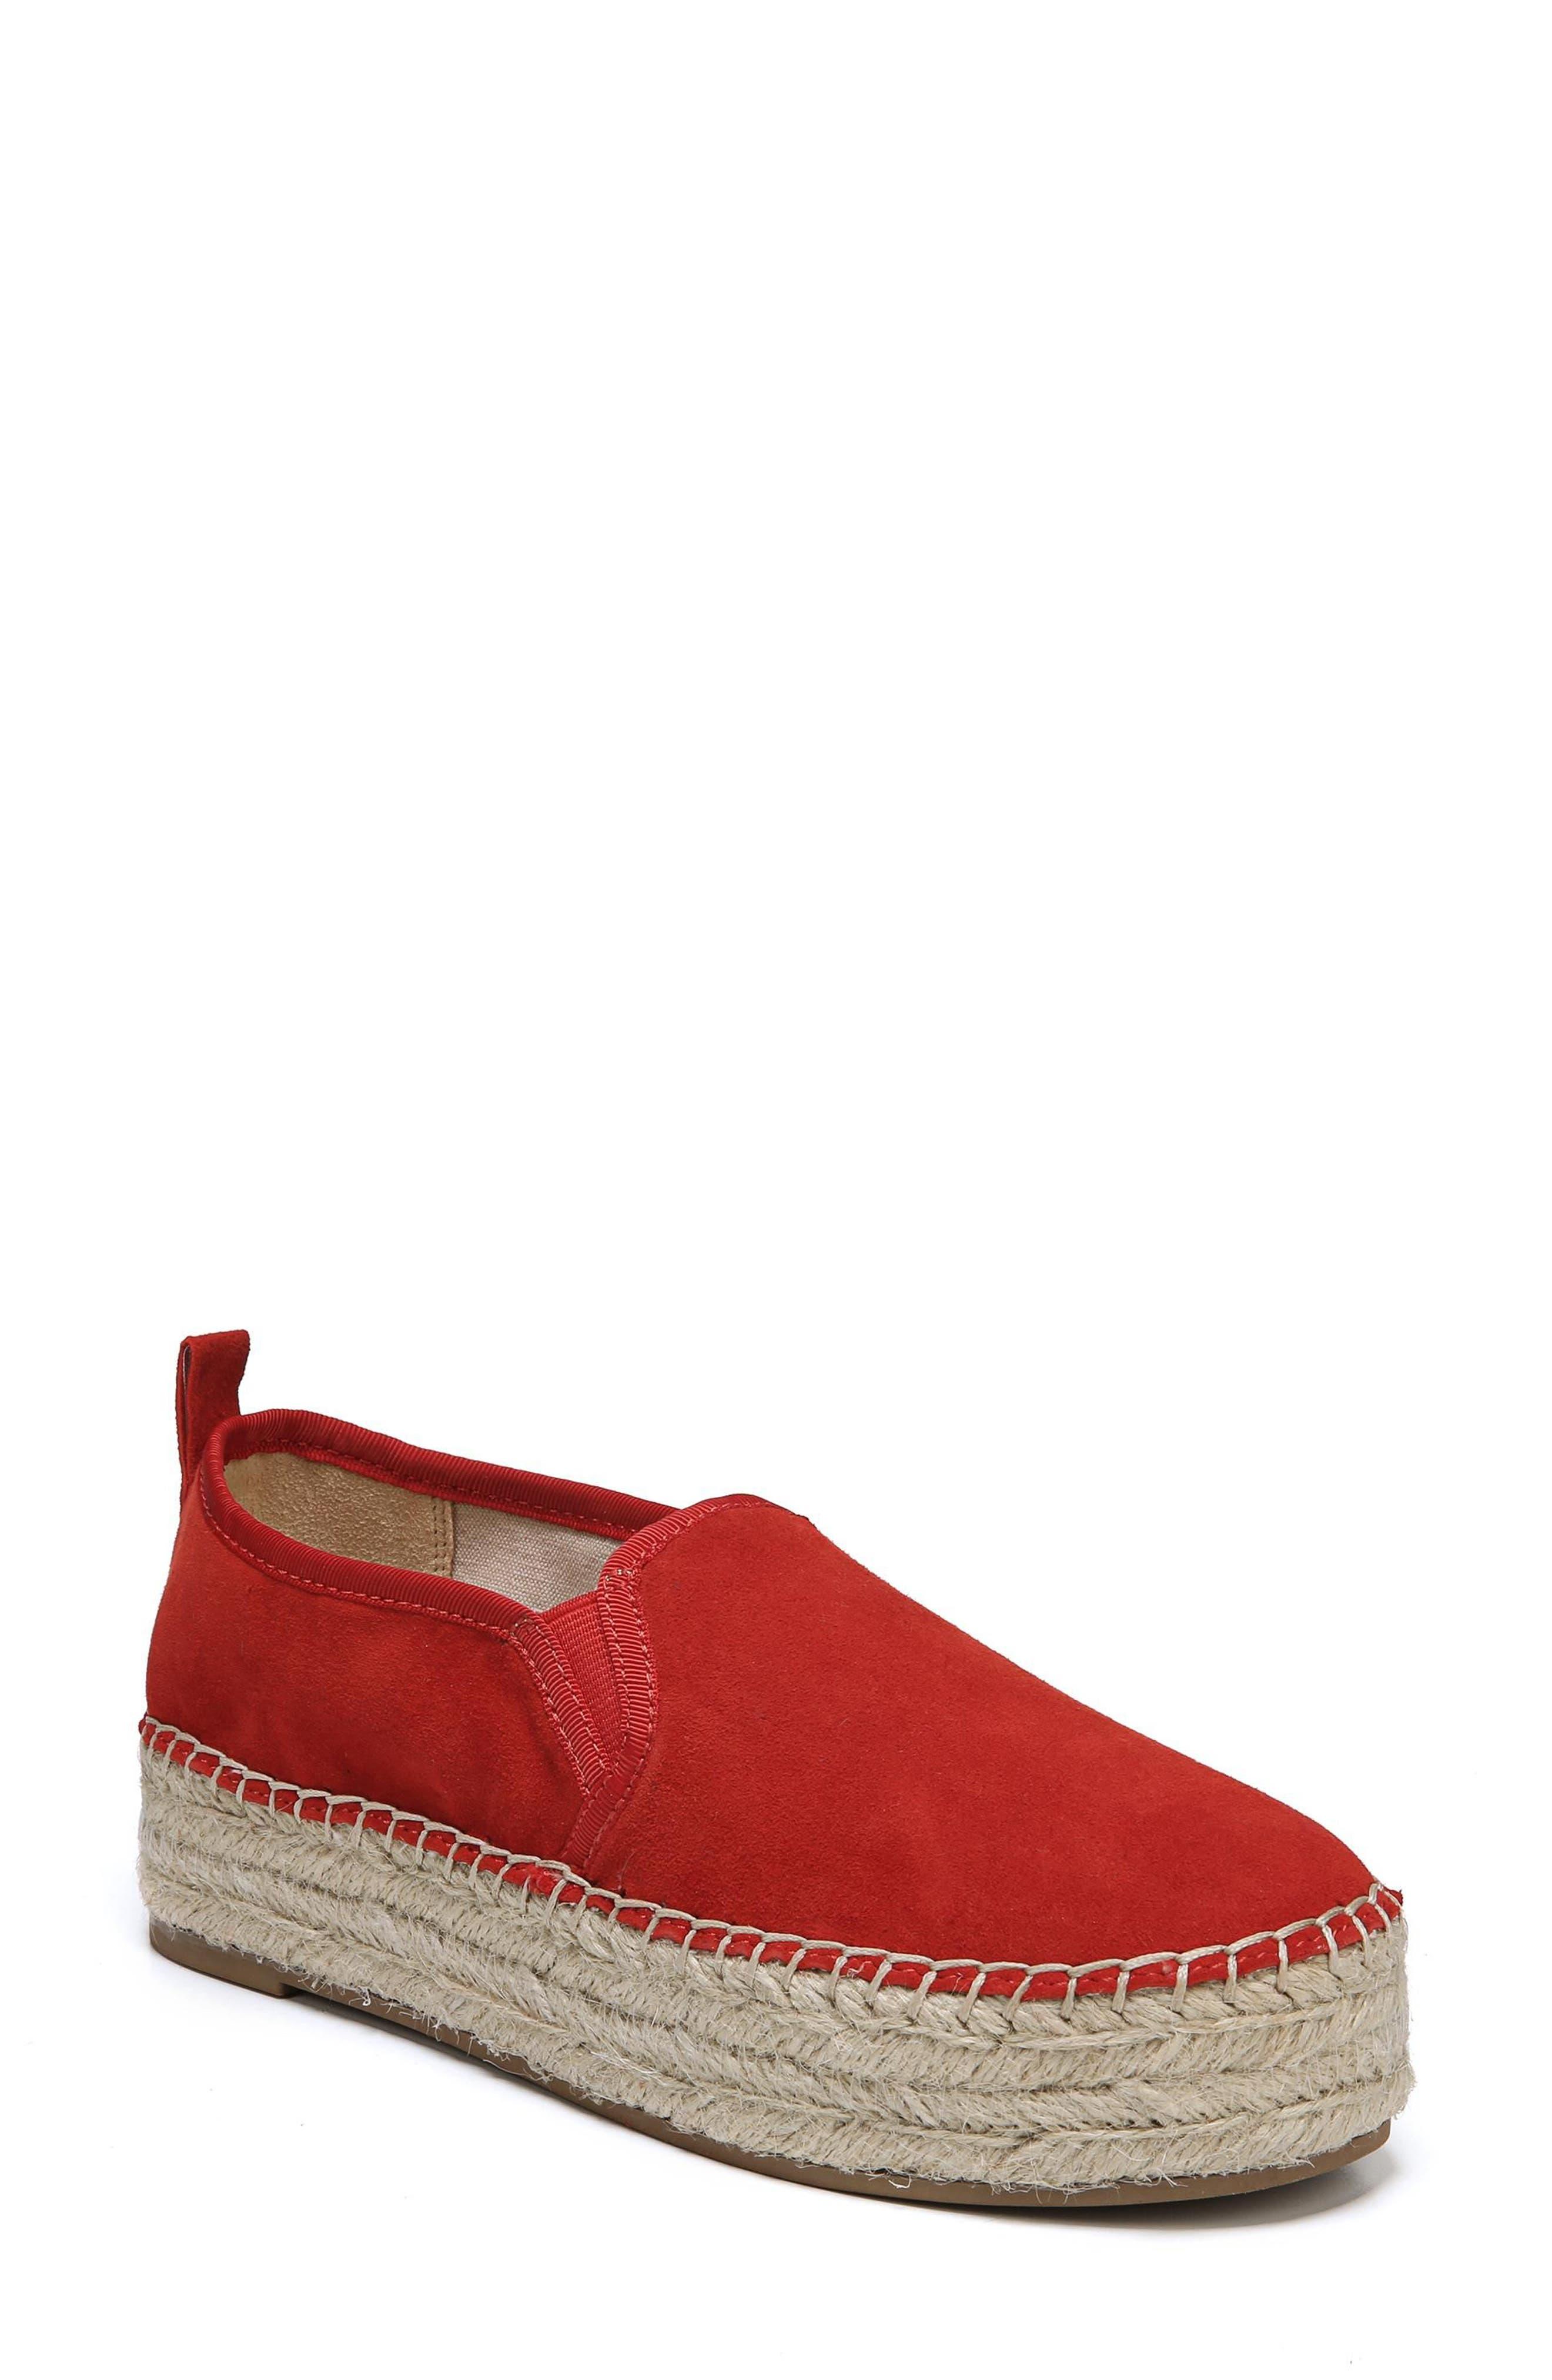 Slip on Sneakers for Women On Sale, Platinum, Leather, 2017, 4.5 5 5.5 6.5 8 8.5 Saint Laurent